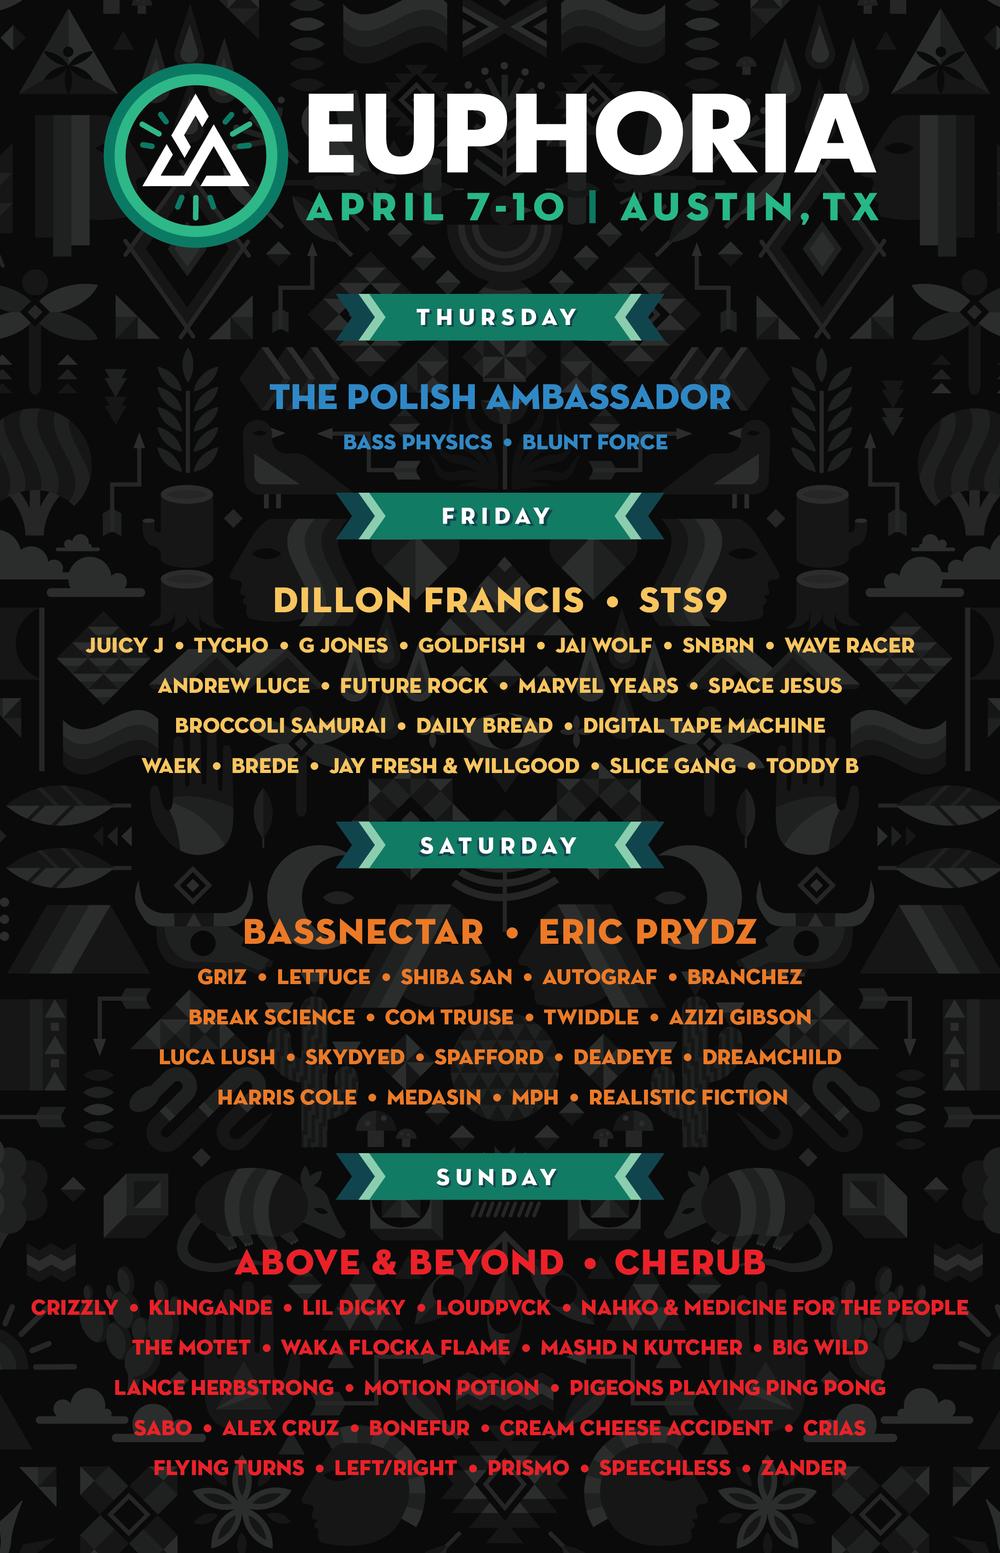 Euphoria 2016 Daily Lineup